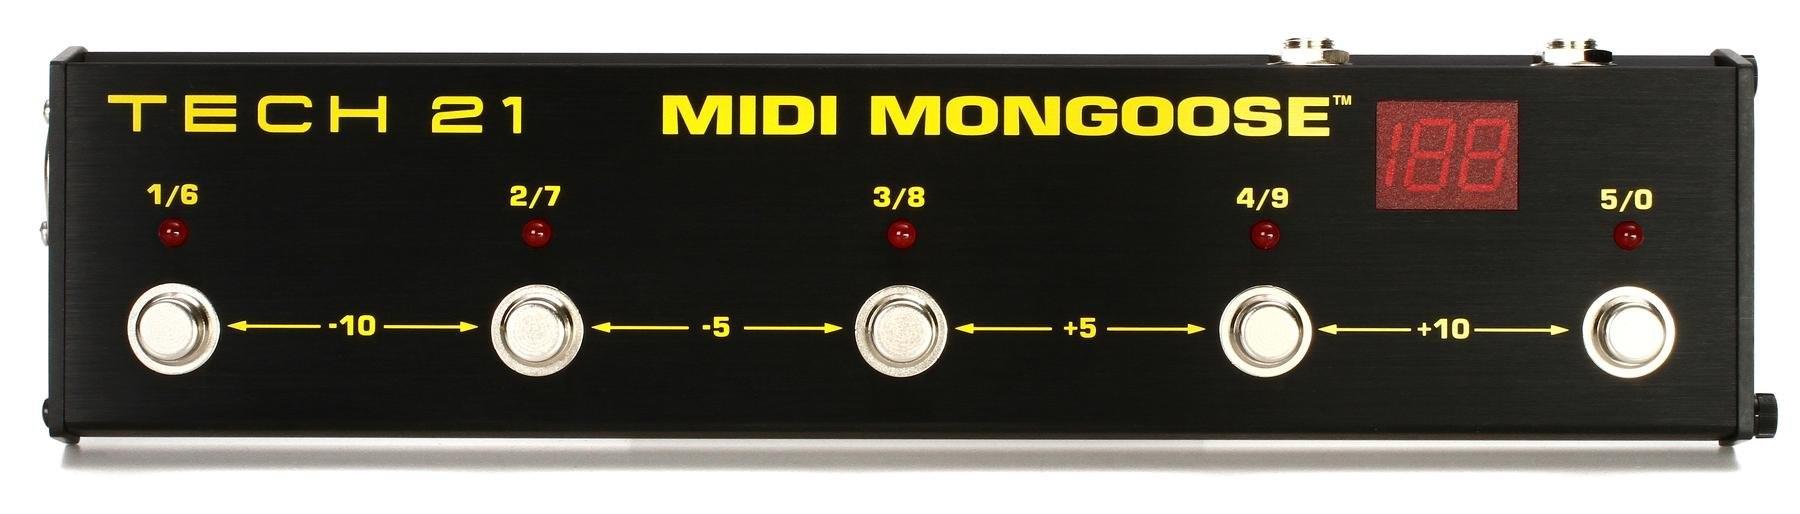 TECH21 MIDI Mongoose